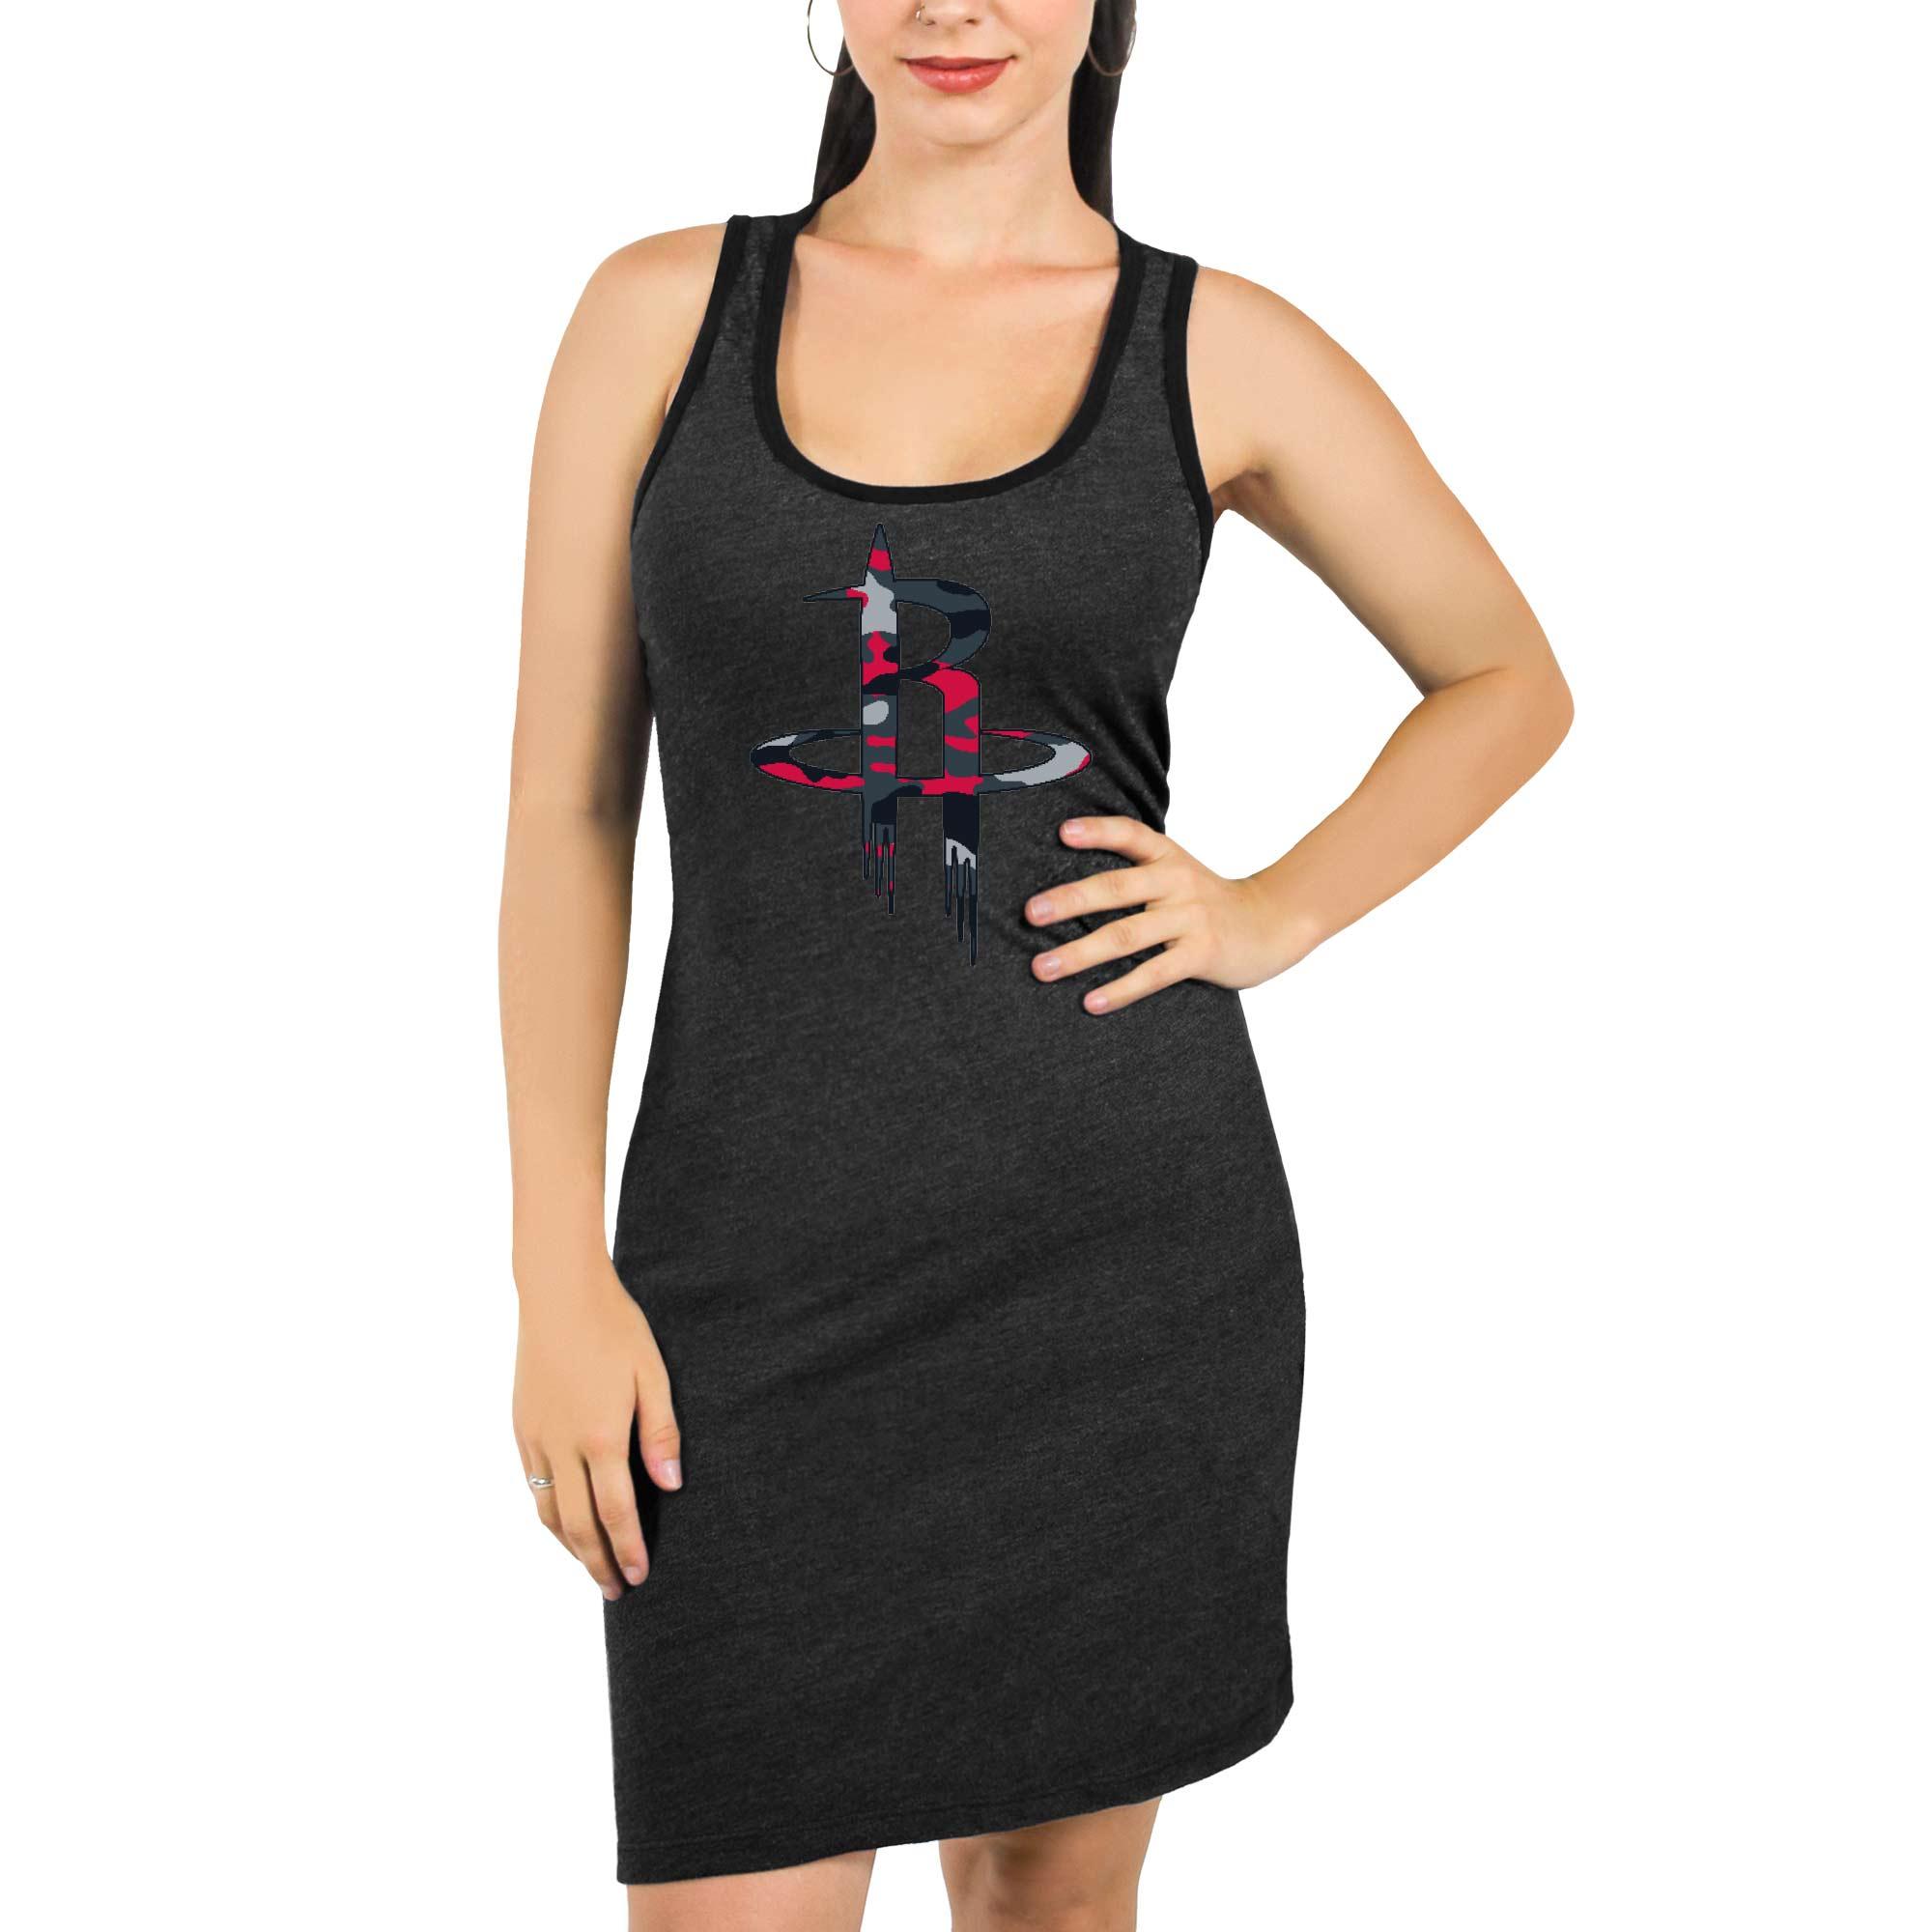 Houston Rockets Majestic Threads Women's Camo Pop Tri-Blend Racerback Sleeveless Dress - Black